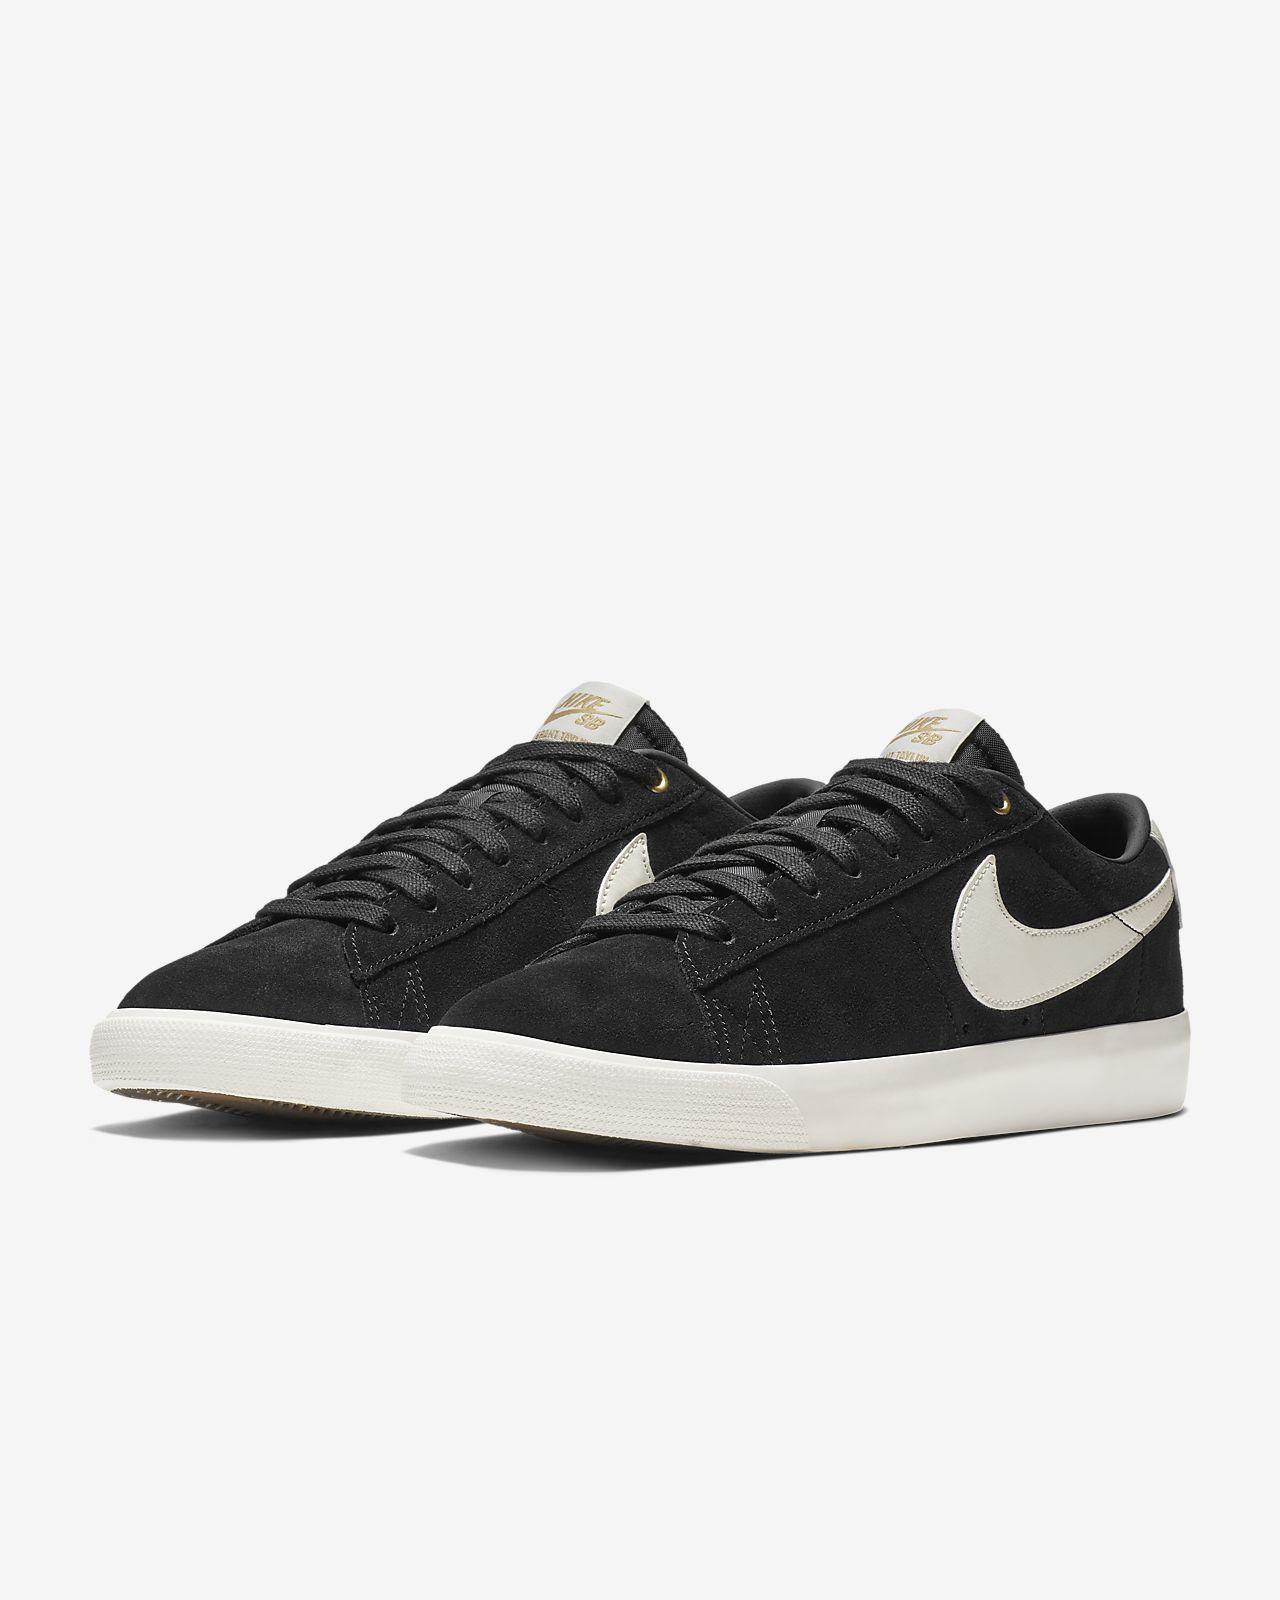 94bf0cc33337f Nike SB Blazer Low GT Skate Shoe. Nike.com CA